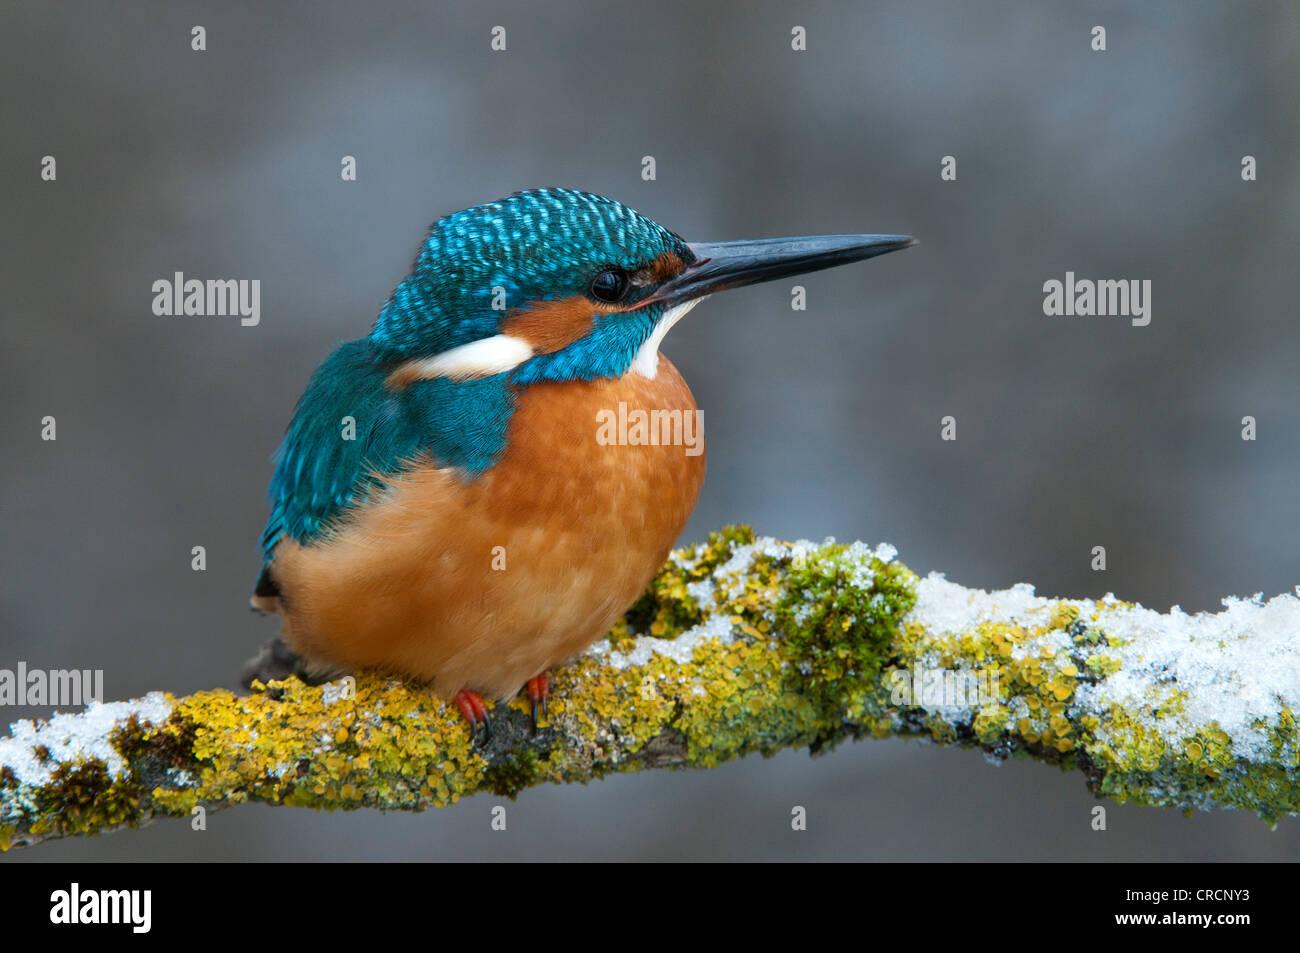 Kingfisher (Alcedo atthis), Tratzberg Conservation Area, Tyrol, Austria, Europe - Stock Image